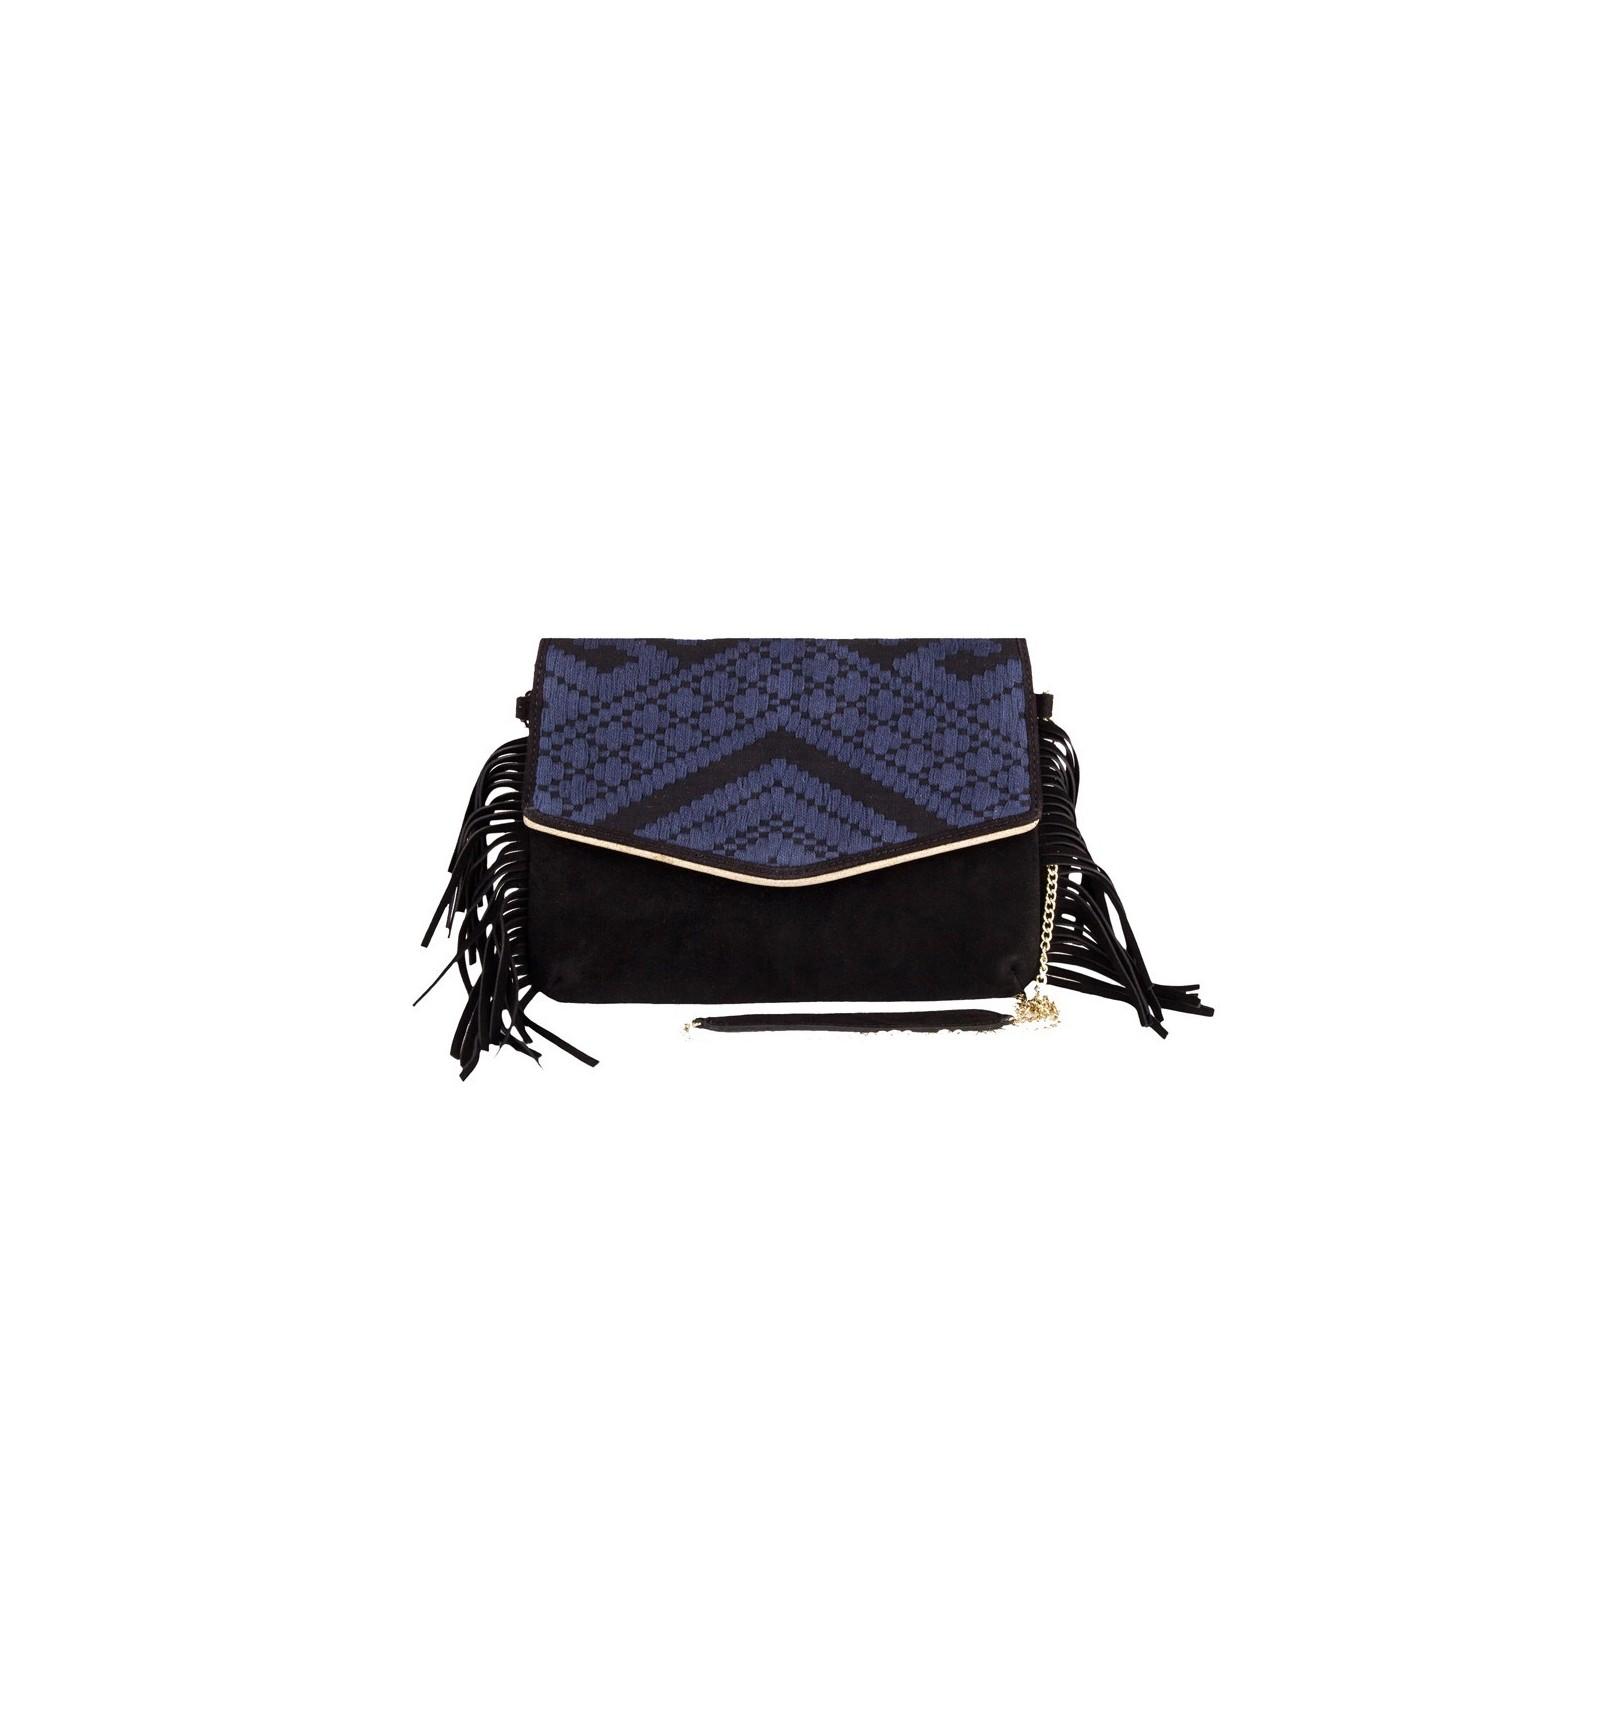 maradji sac pochette daphnee blue cuir vachette nucuck. Black Bedroom Furniture Sets. Home Design Ideas